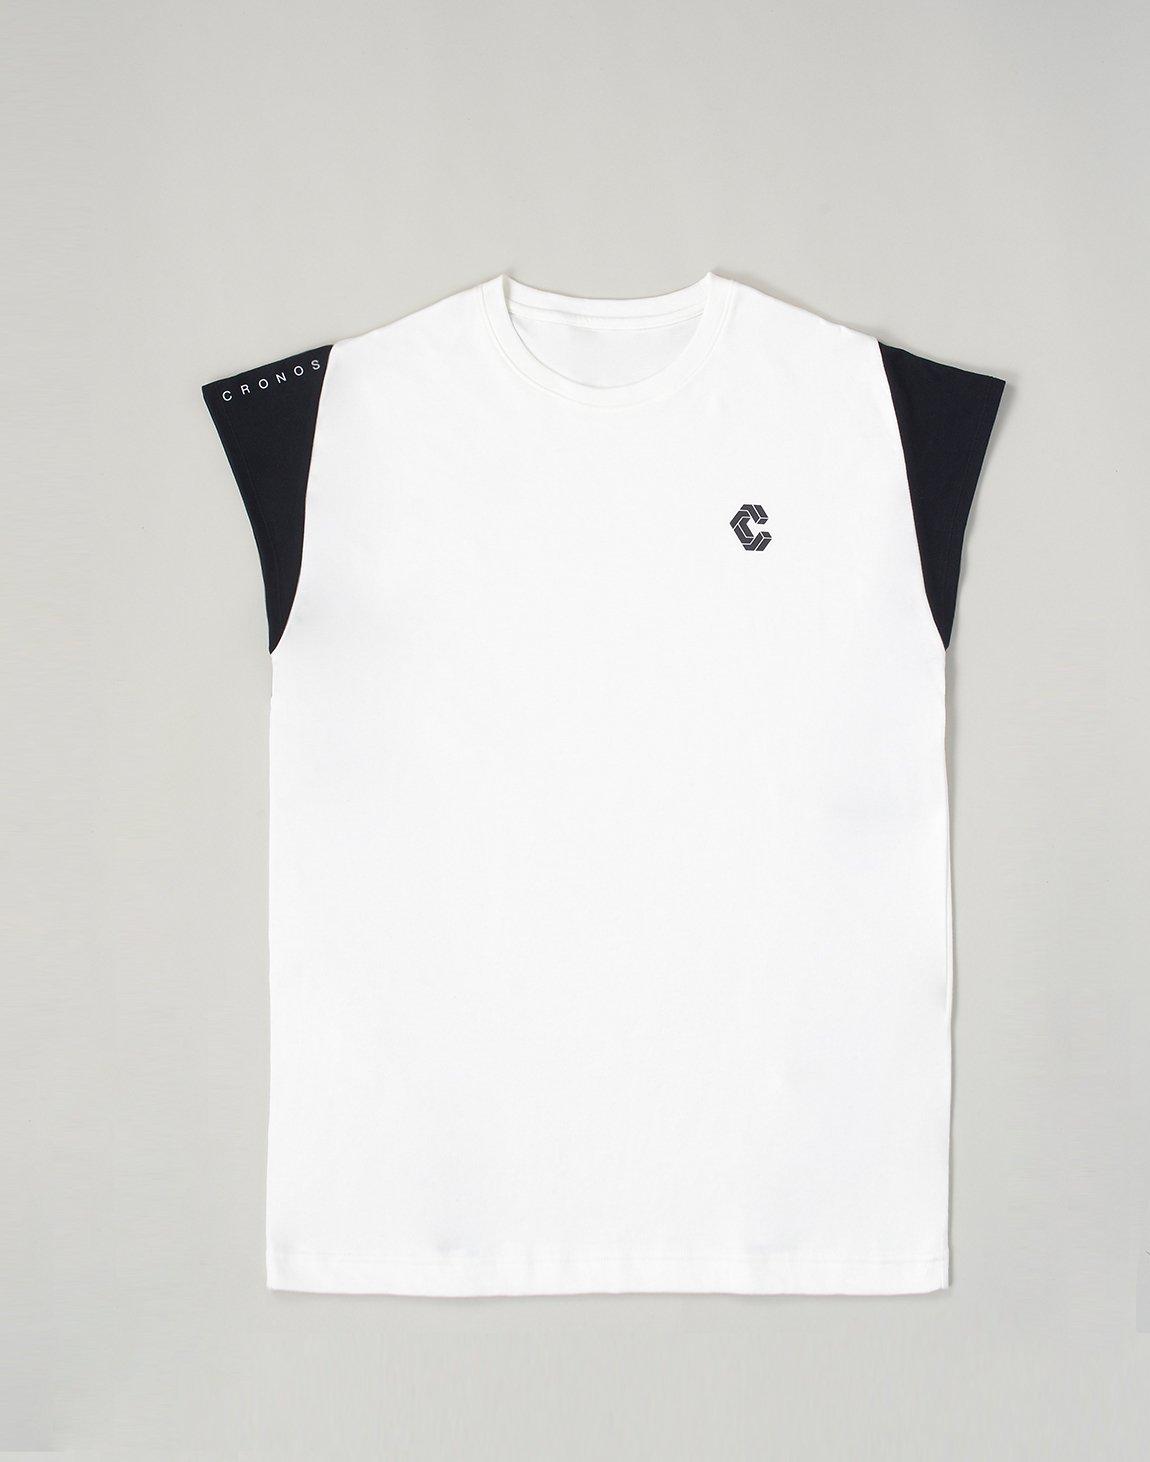 CRONOS LATS LINE CAP SLEEVE TOP【WHITE】